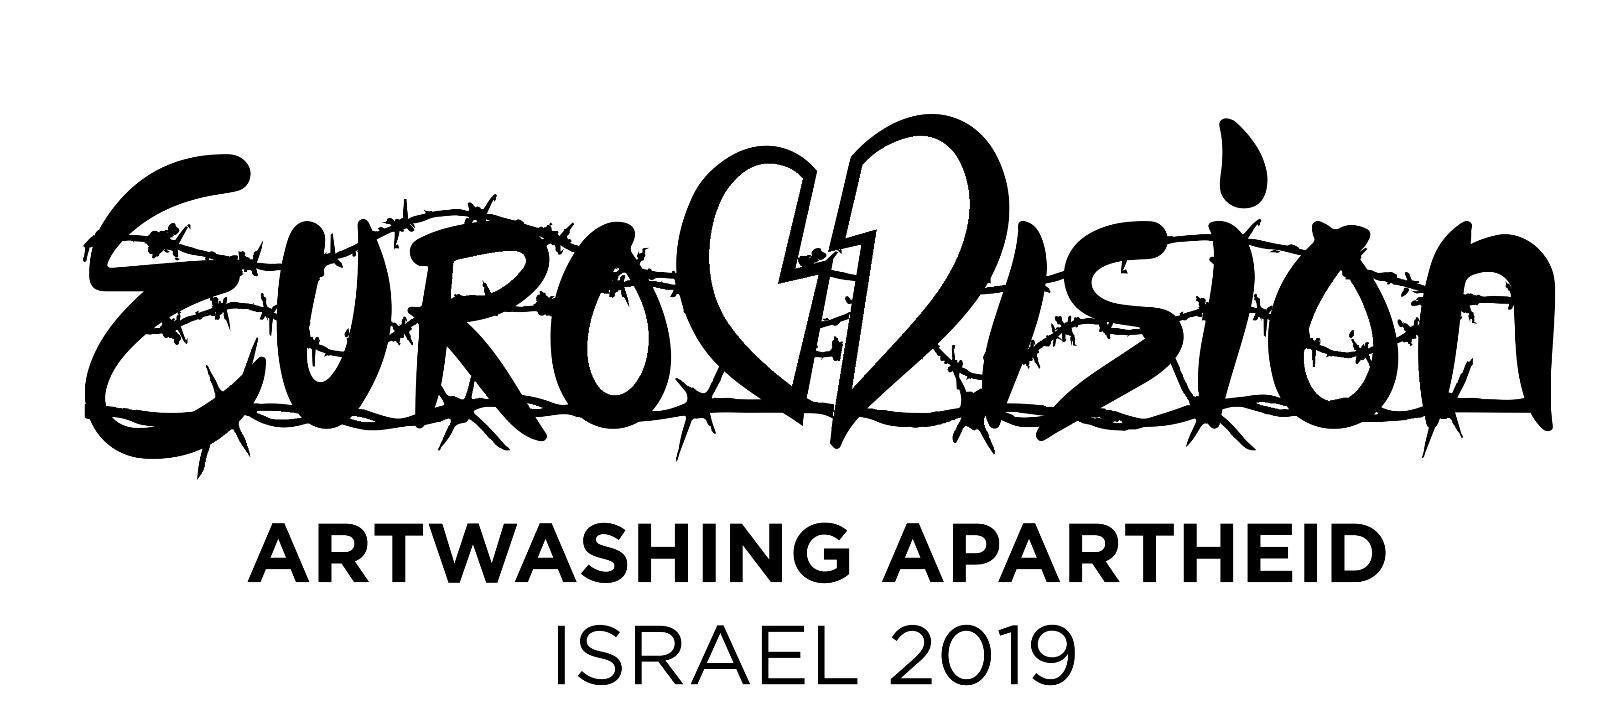 Boycott Eurovision 2019 | BDS Movement